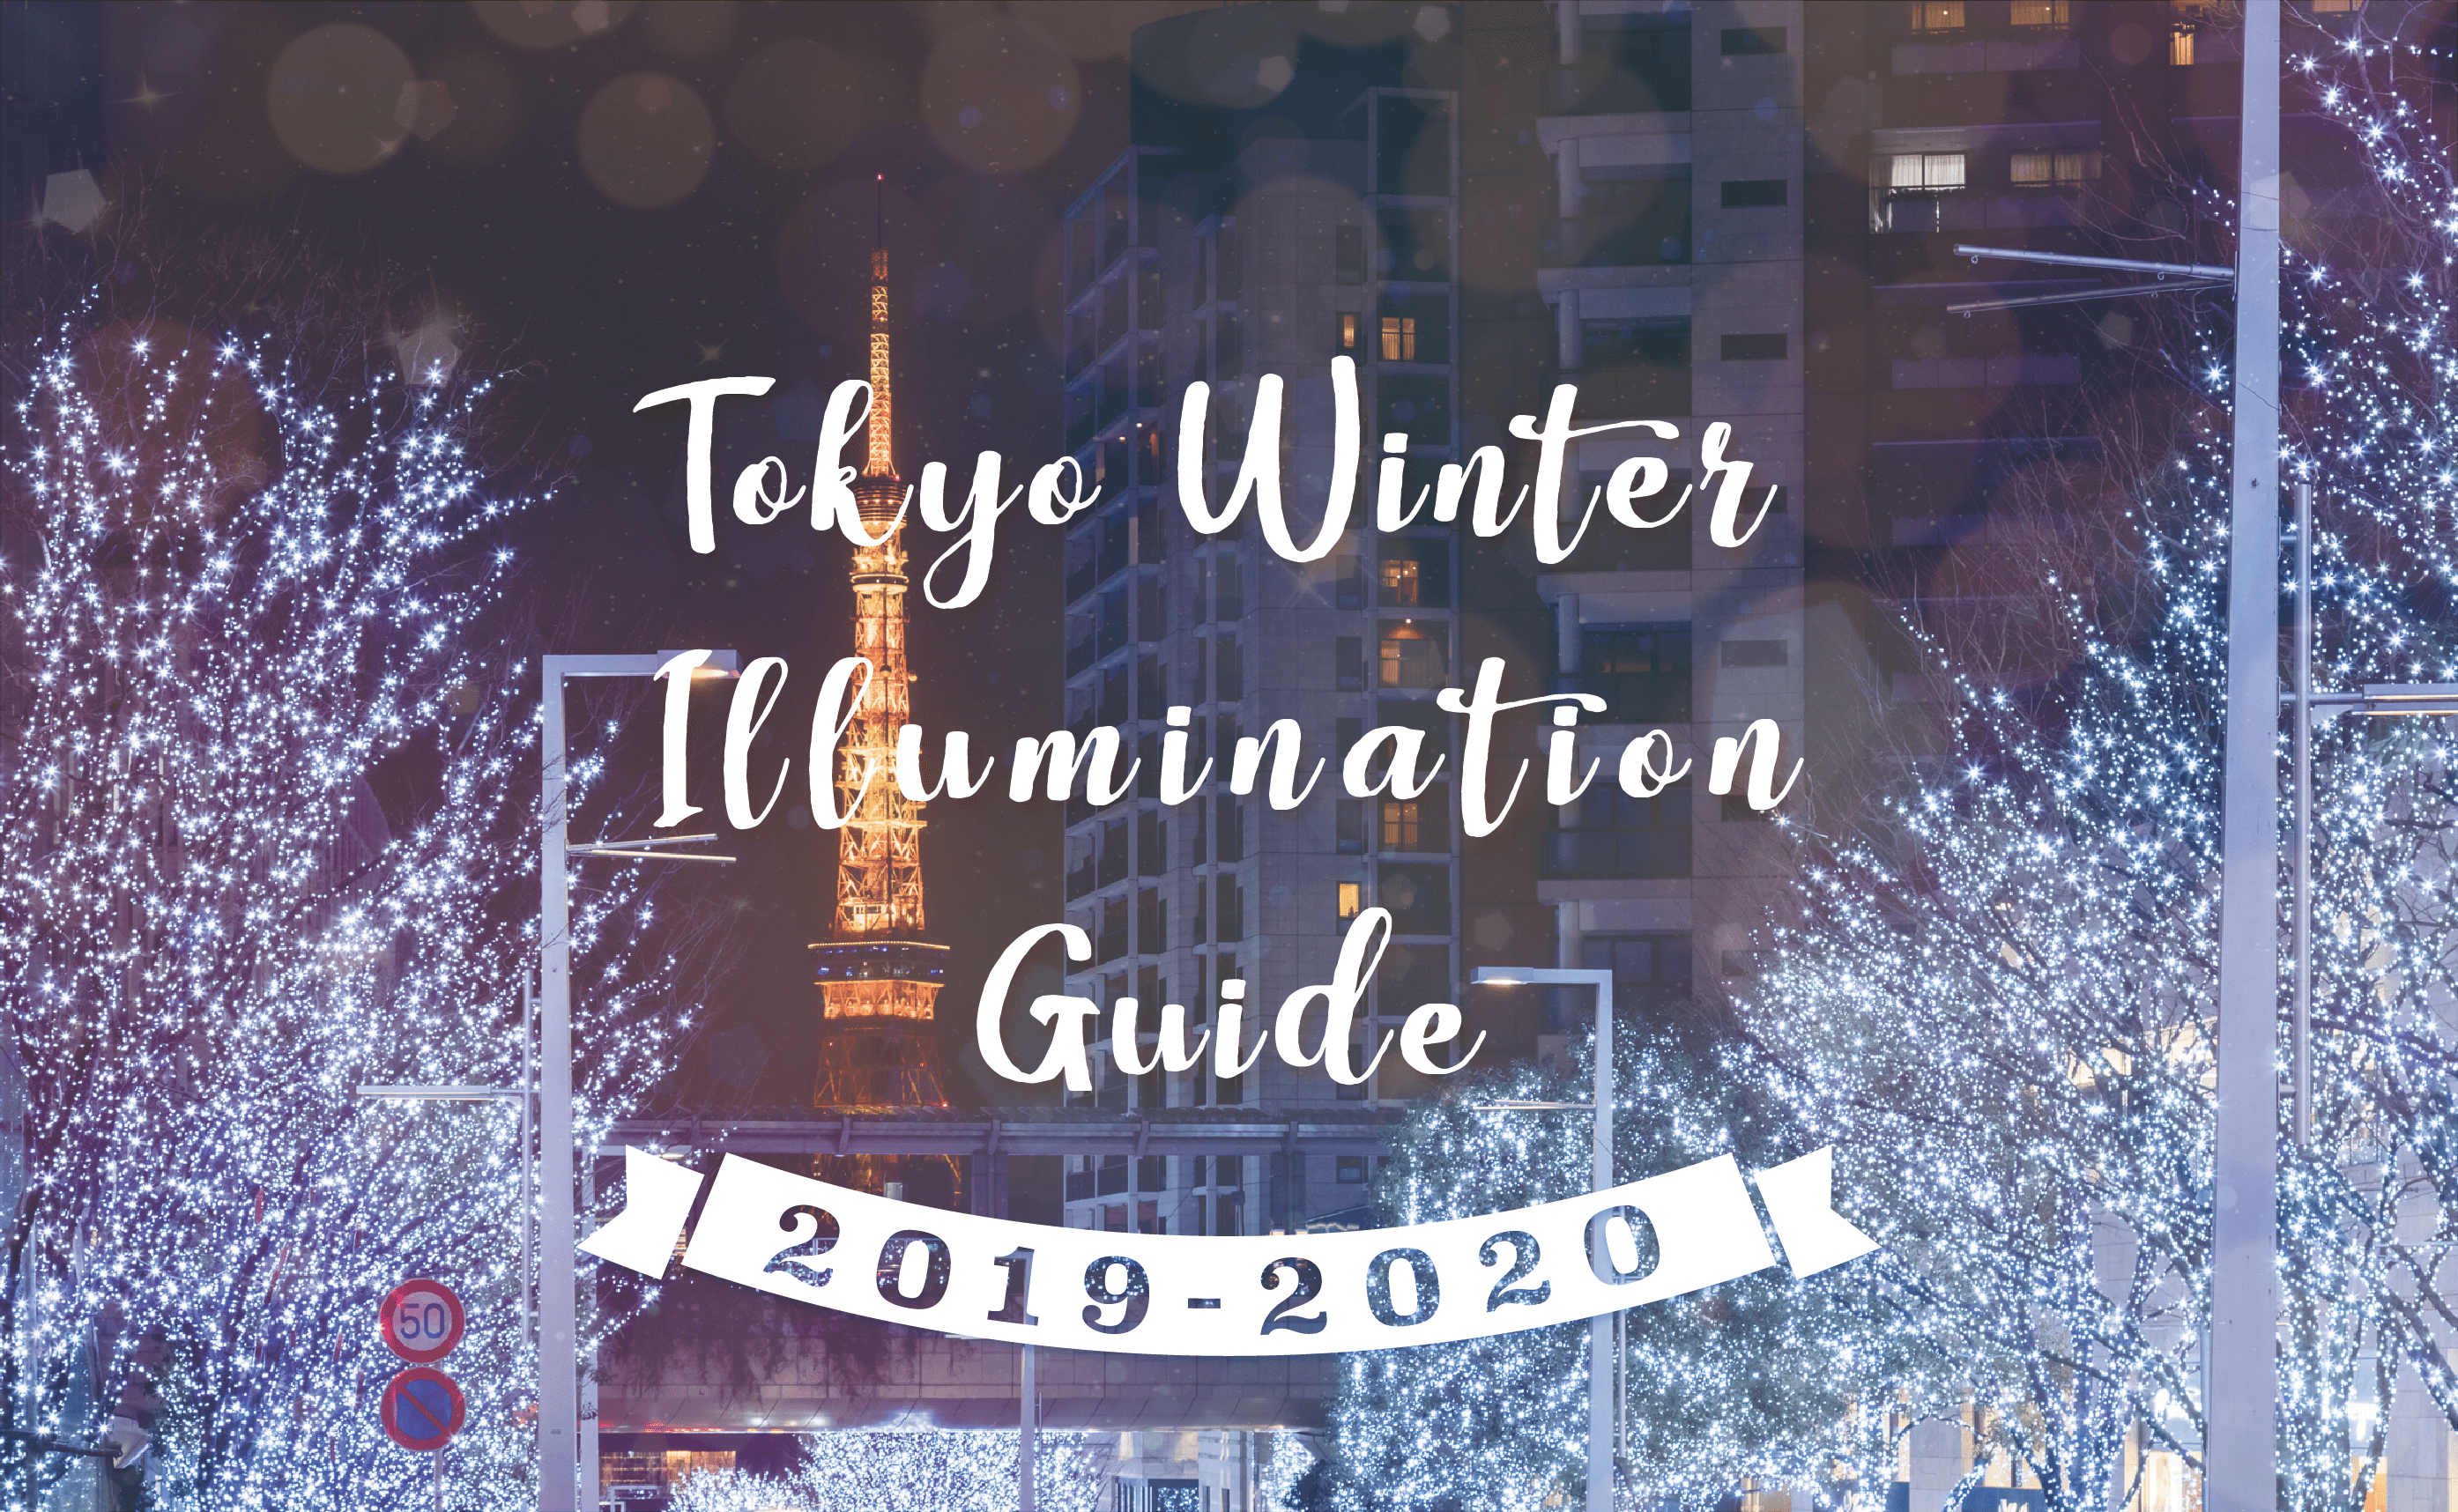 Tokyo Winter Illumination Guide 2019–2020